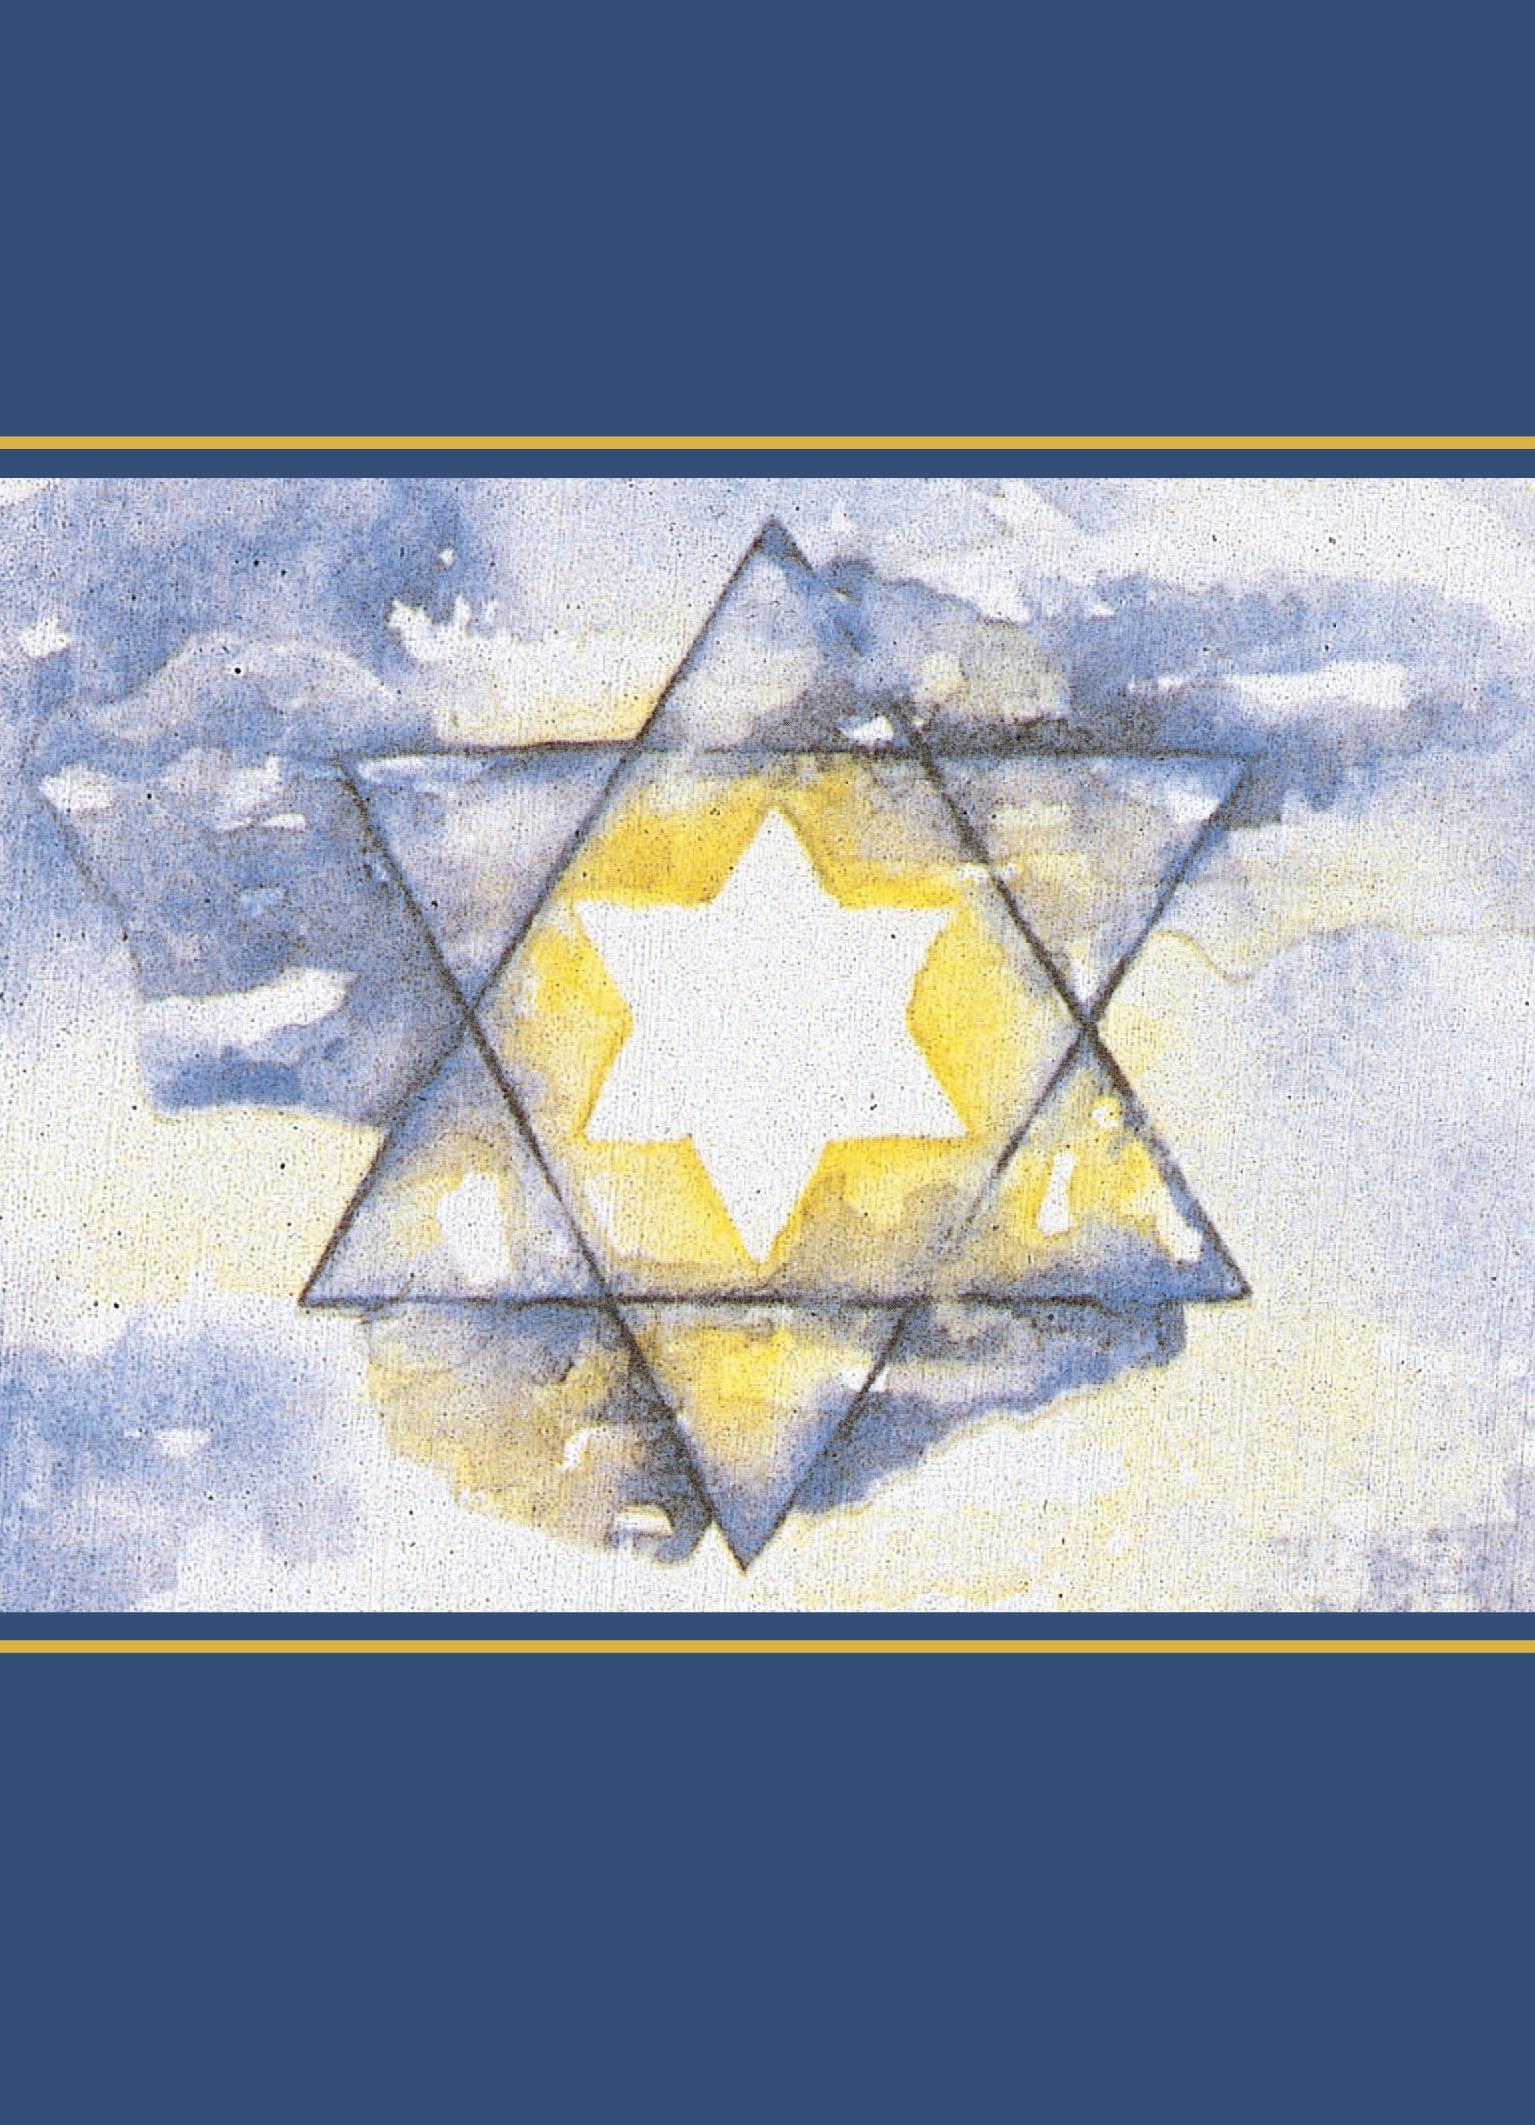 Bible (Star of David Edition)